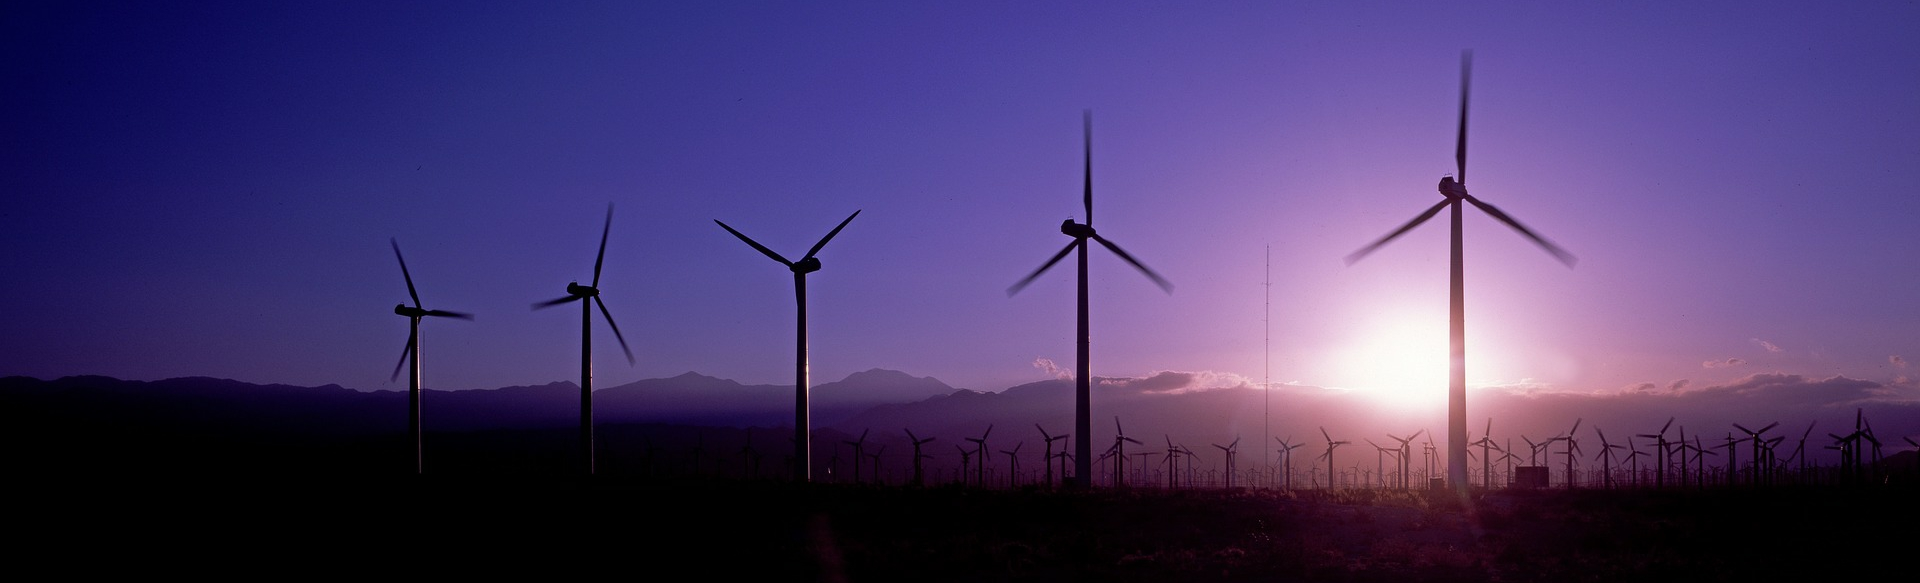 UTP Precision Engineers Engineering renewable energy wind sustainability environmental impacts good practices sustainable environment